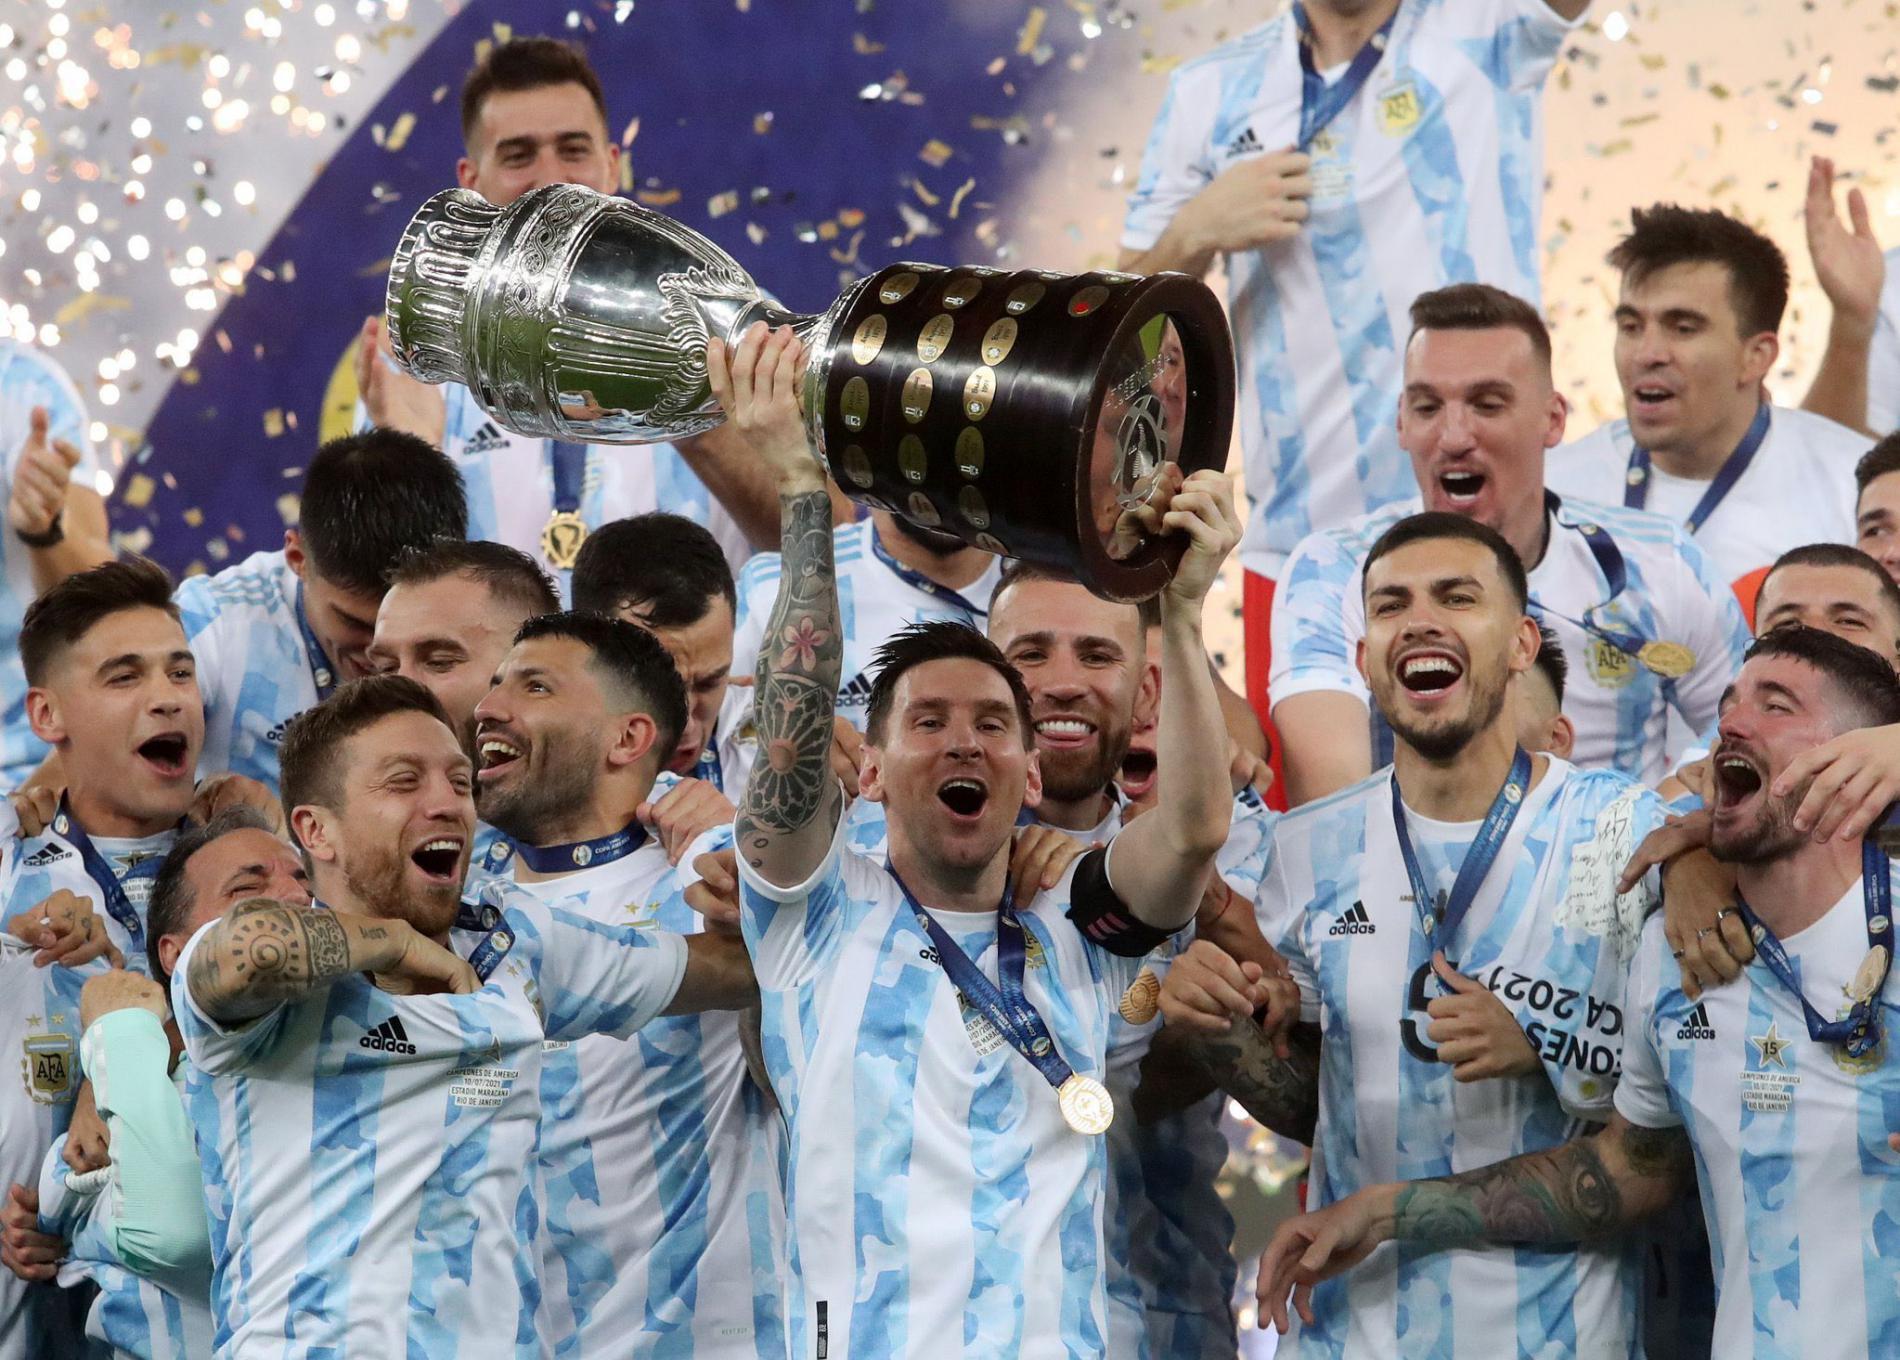 Messi Dedikasikan Kemenangan Argentina dalam Copa Amerika untuk Keluarga, Negara dan Maradona